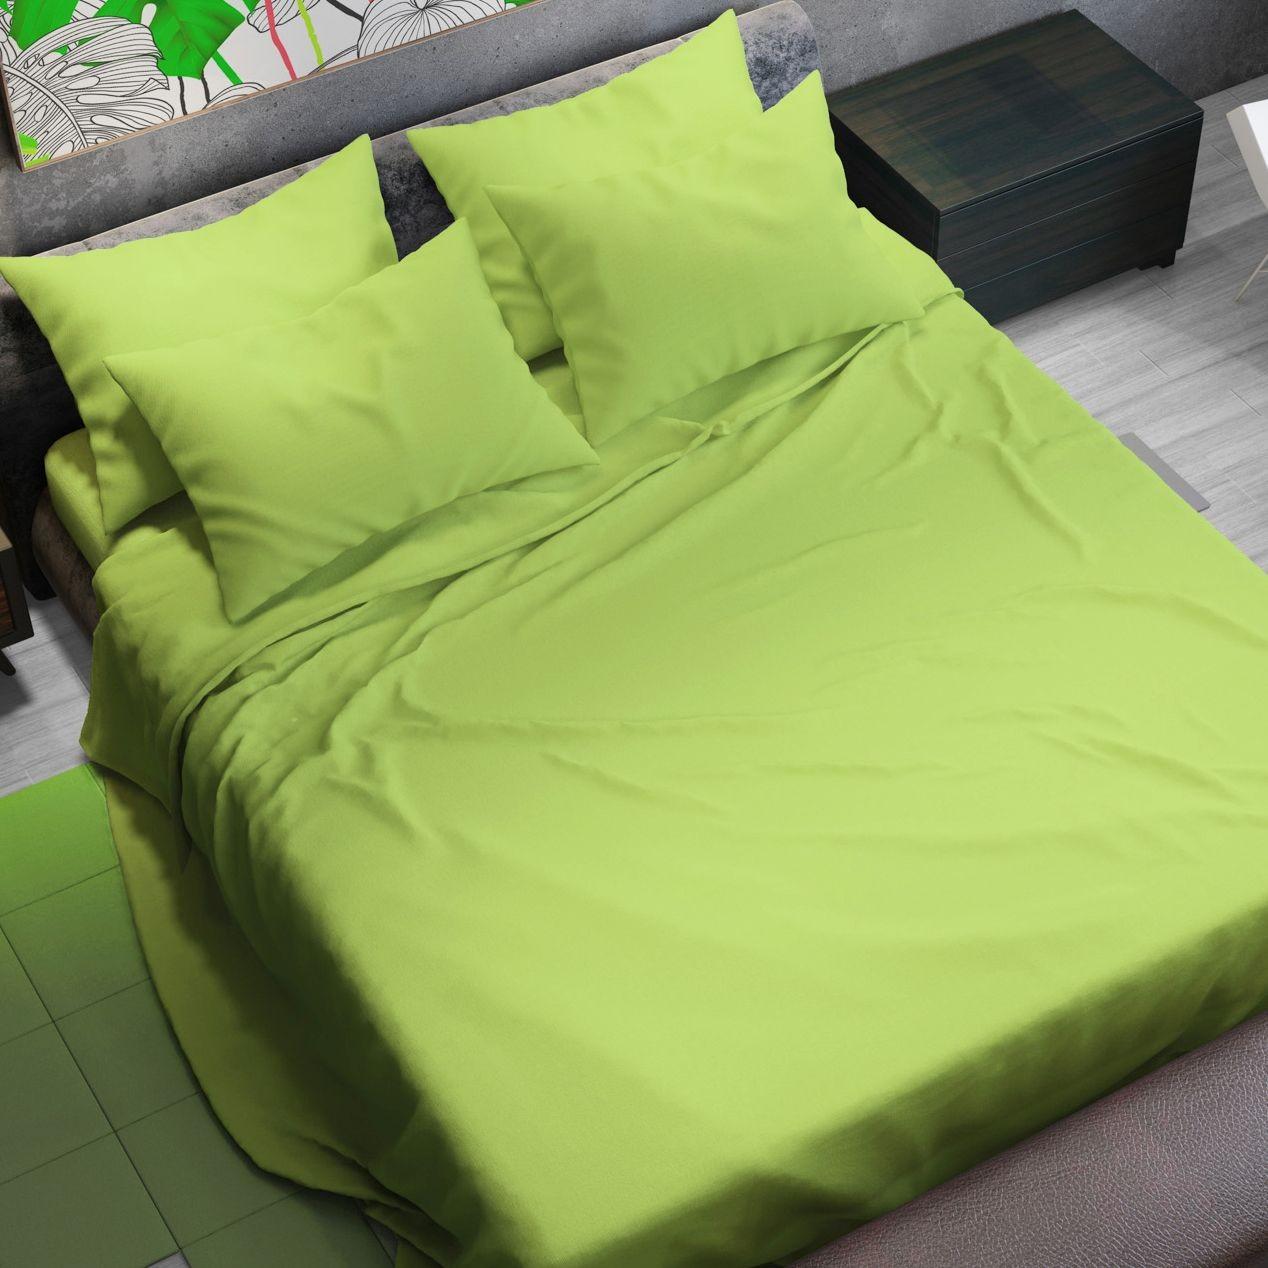 Completo lenzuola verde pastello